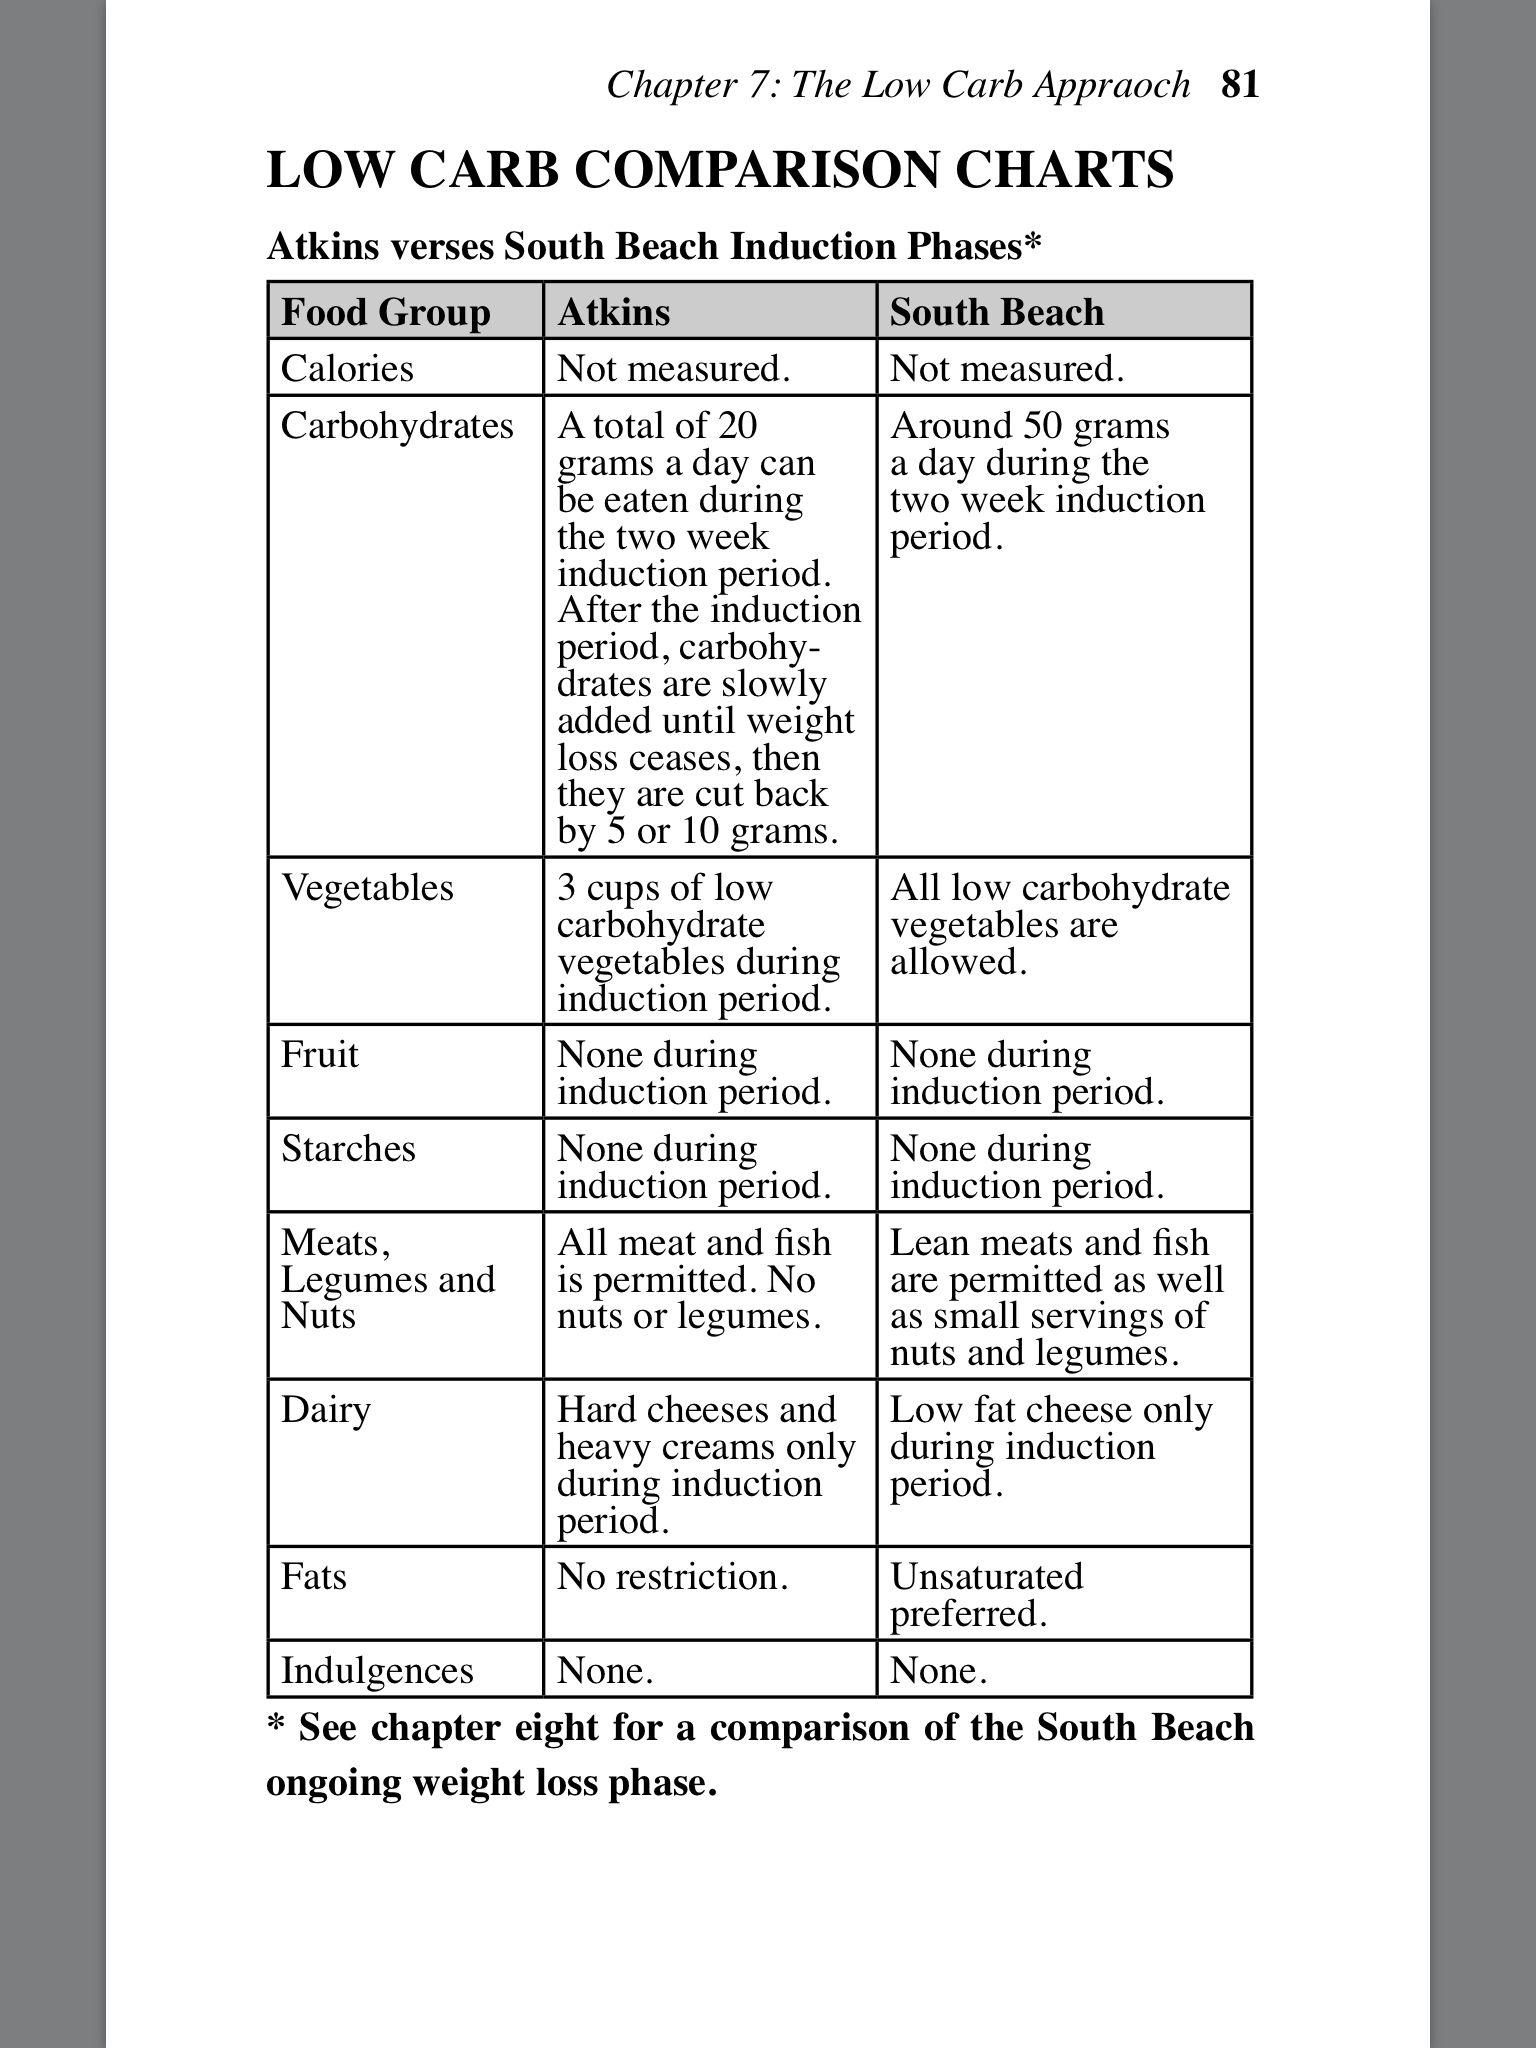 compare atki s to south beach diets